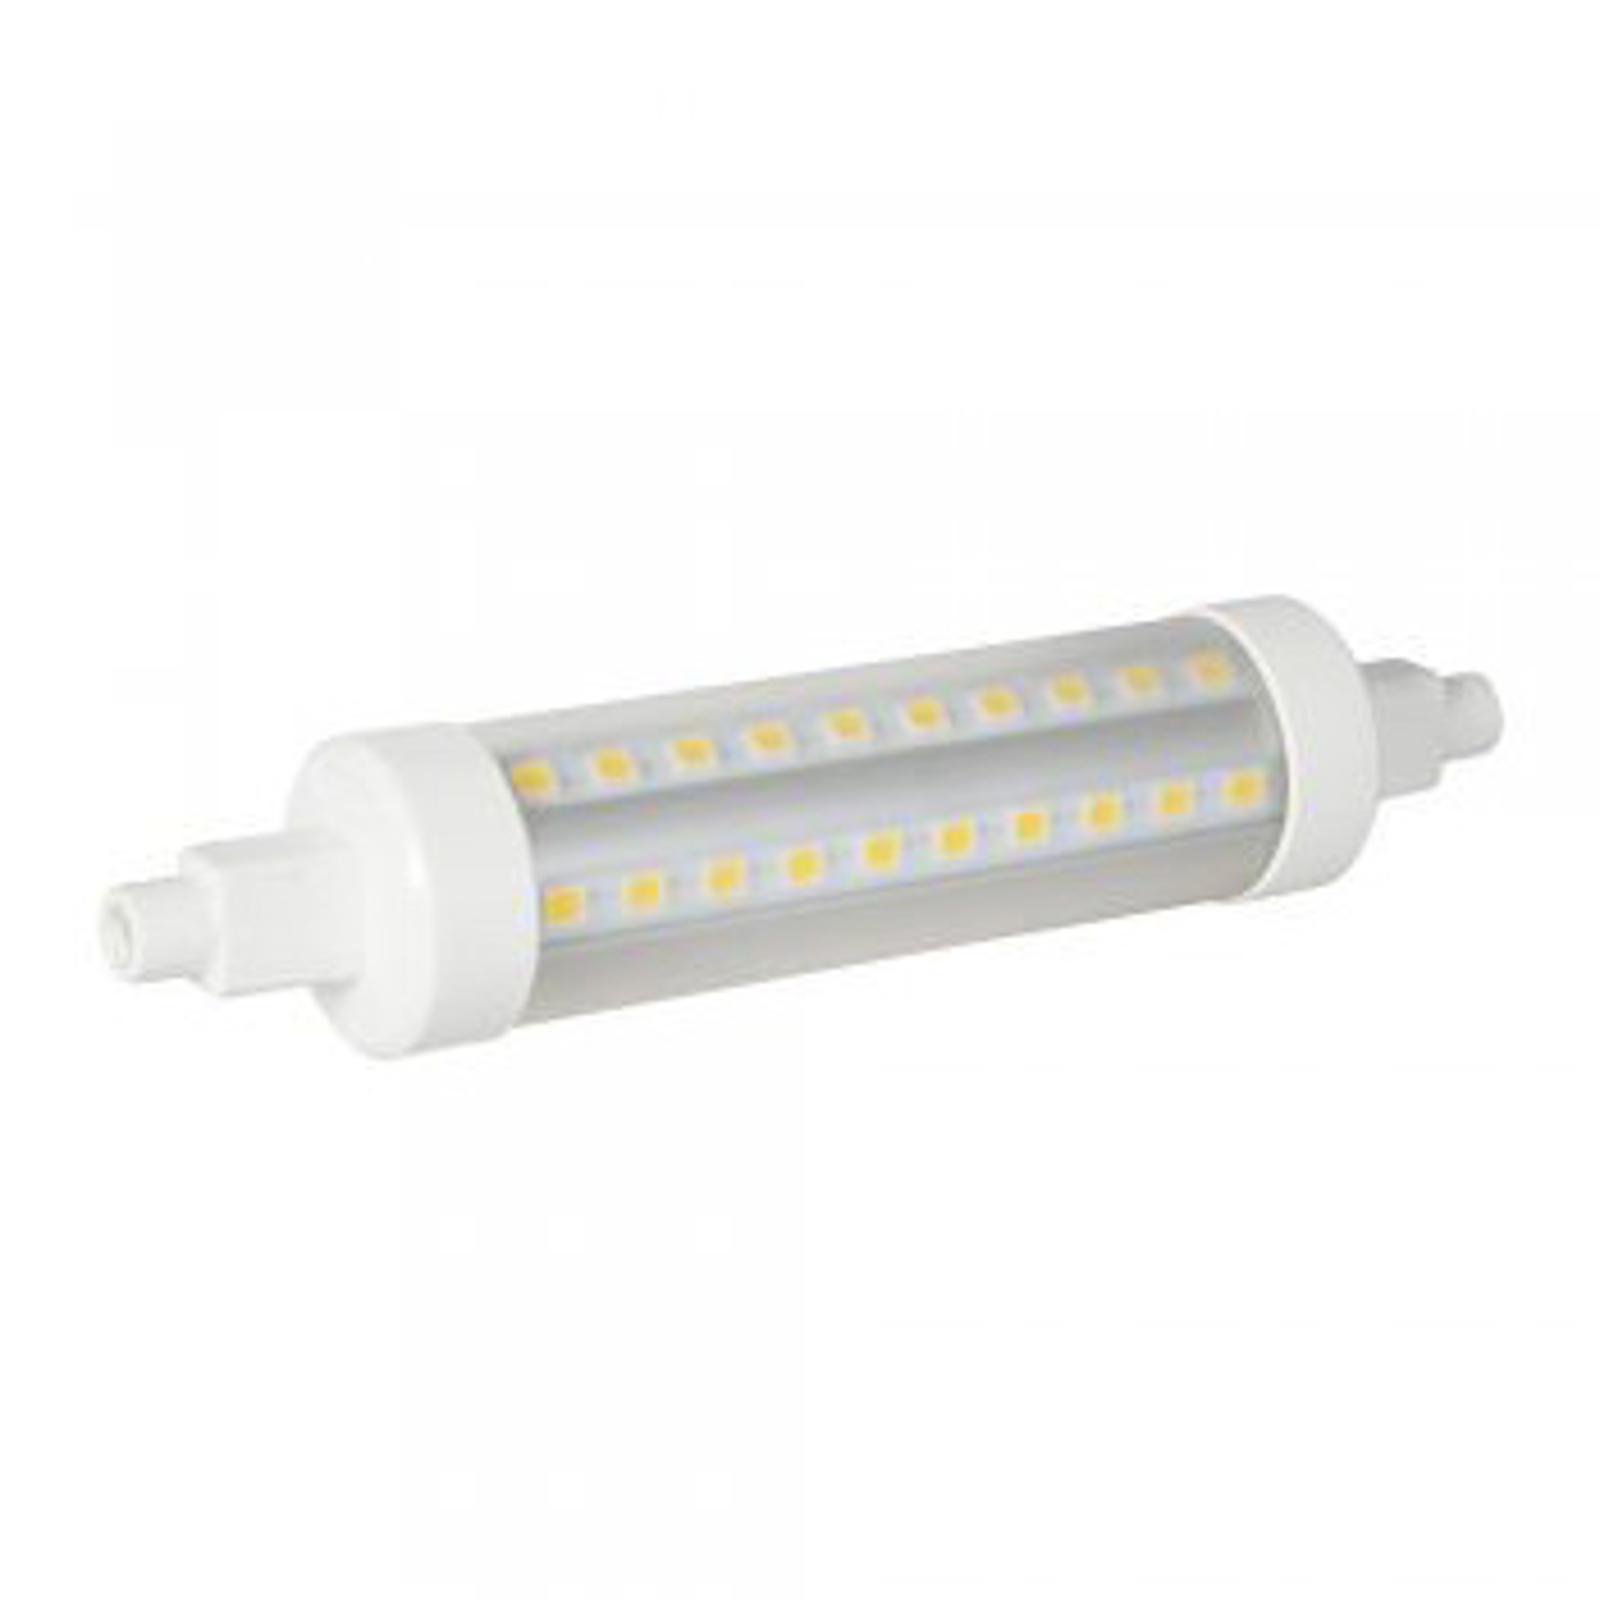 R7s 8W 827 LED-pære VEO i stavform